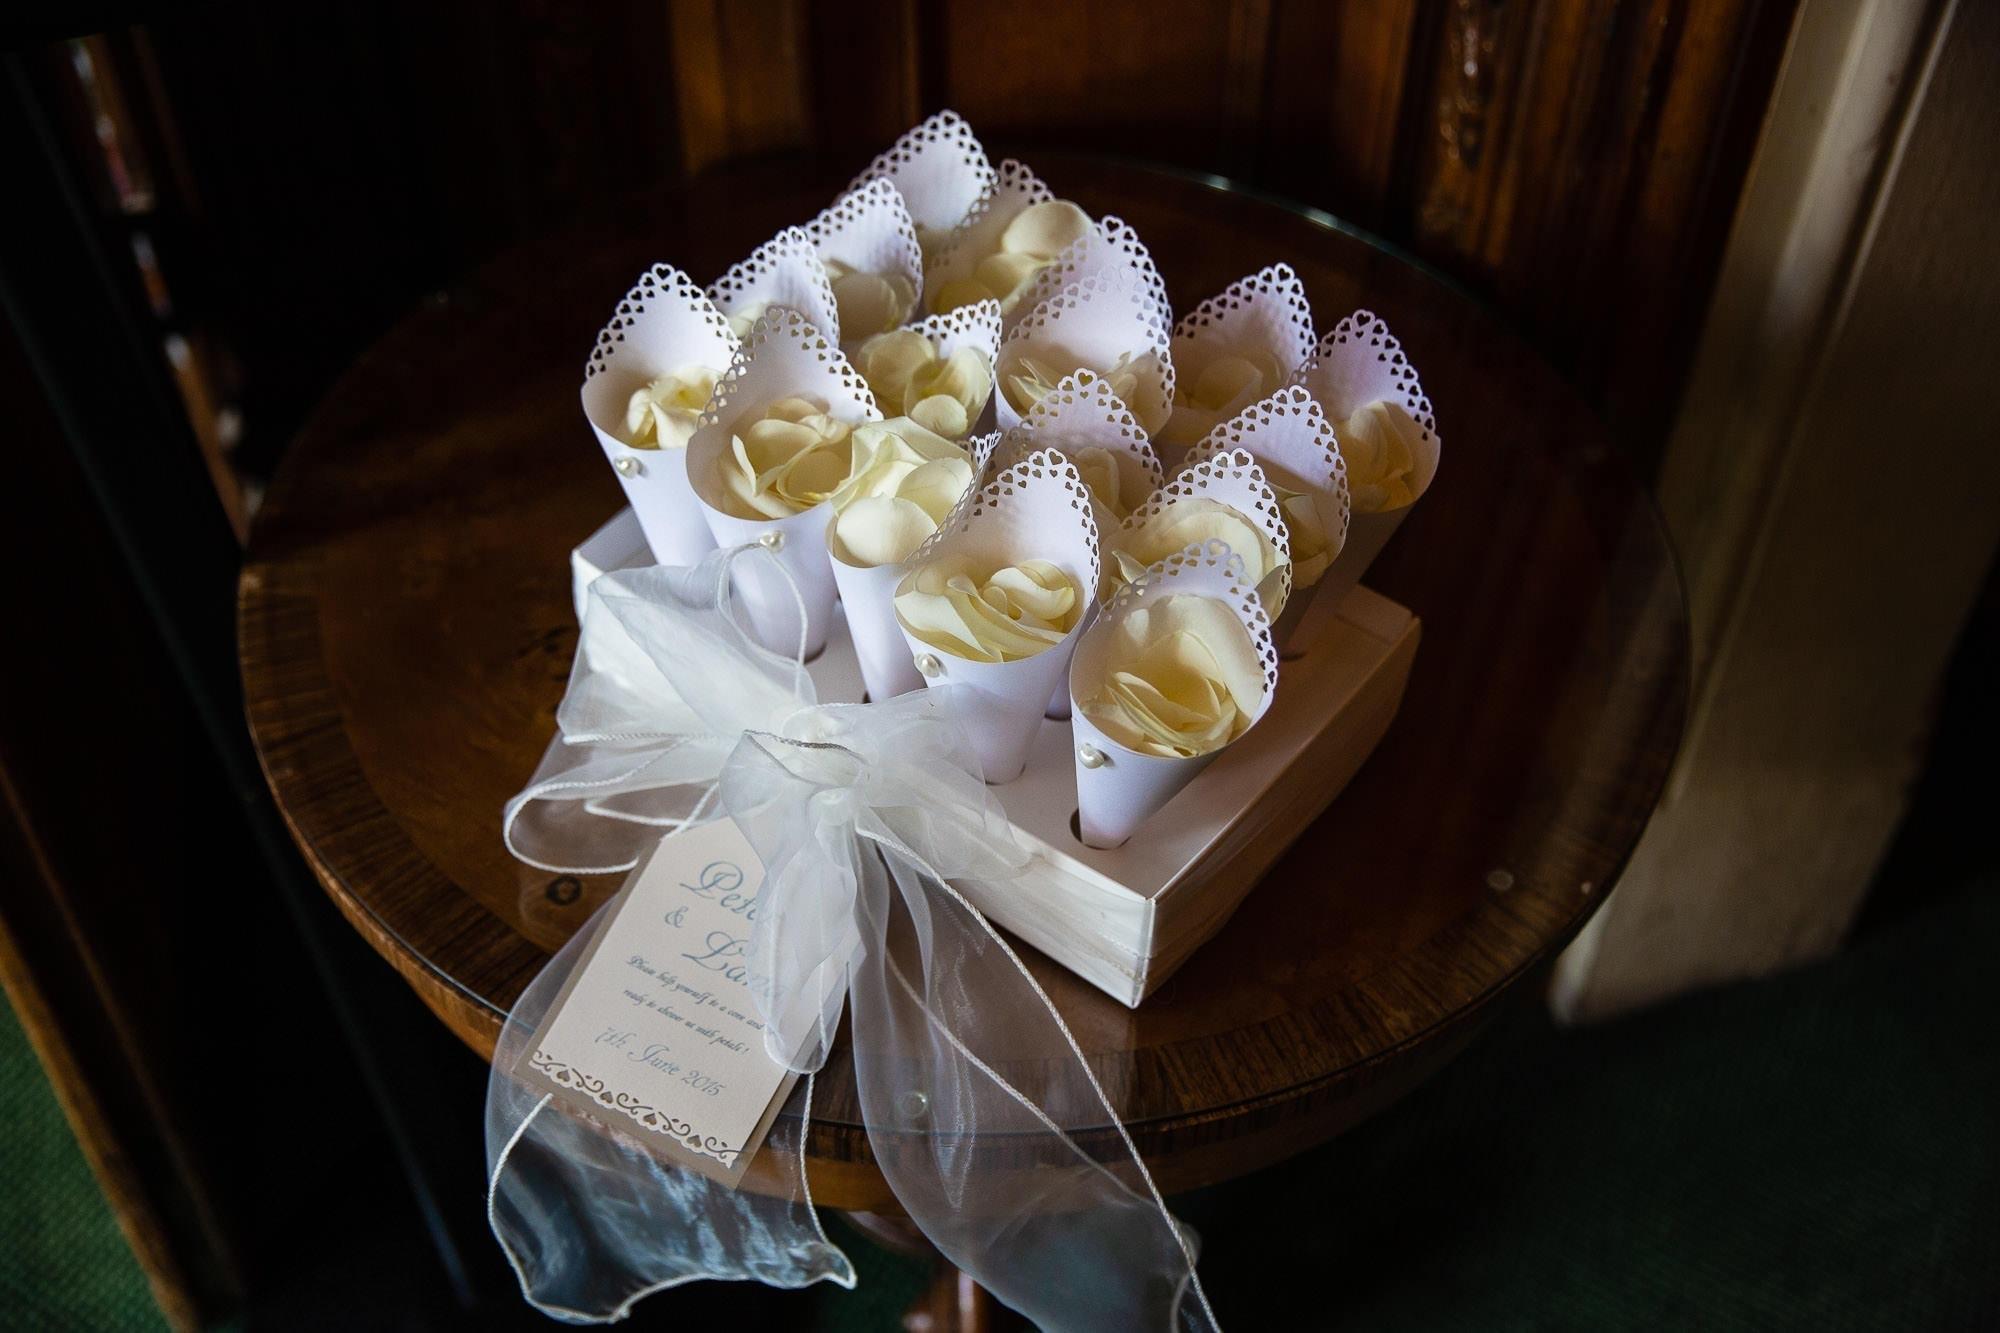 Confetti Cones with White flower petals